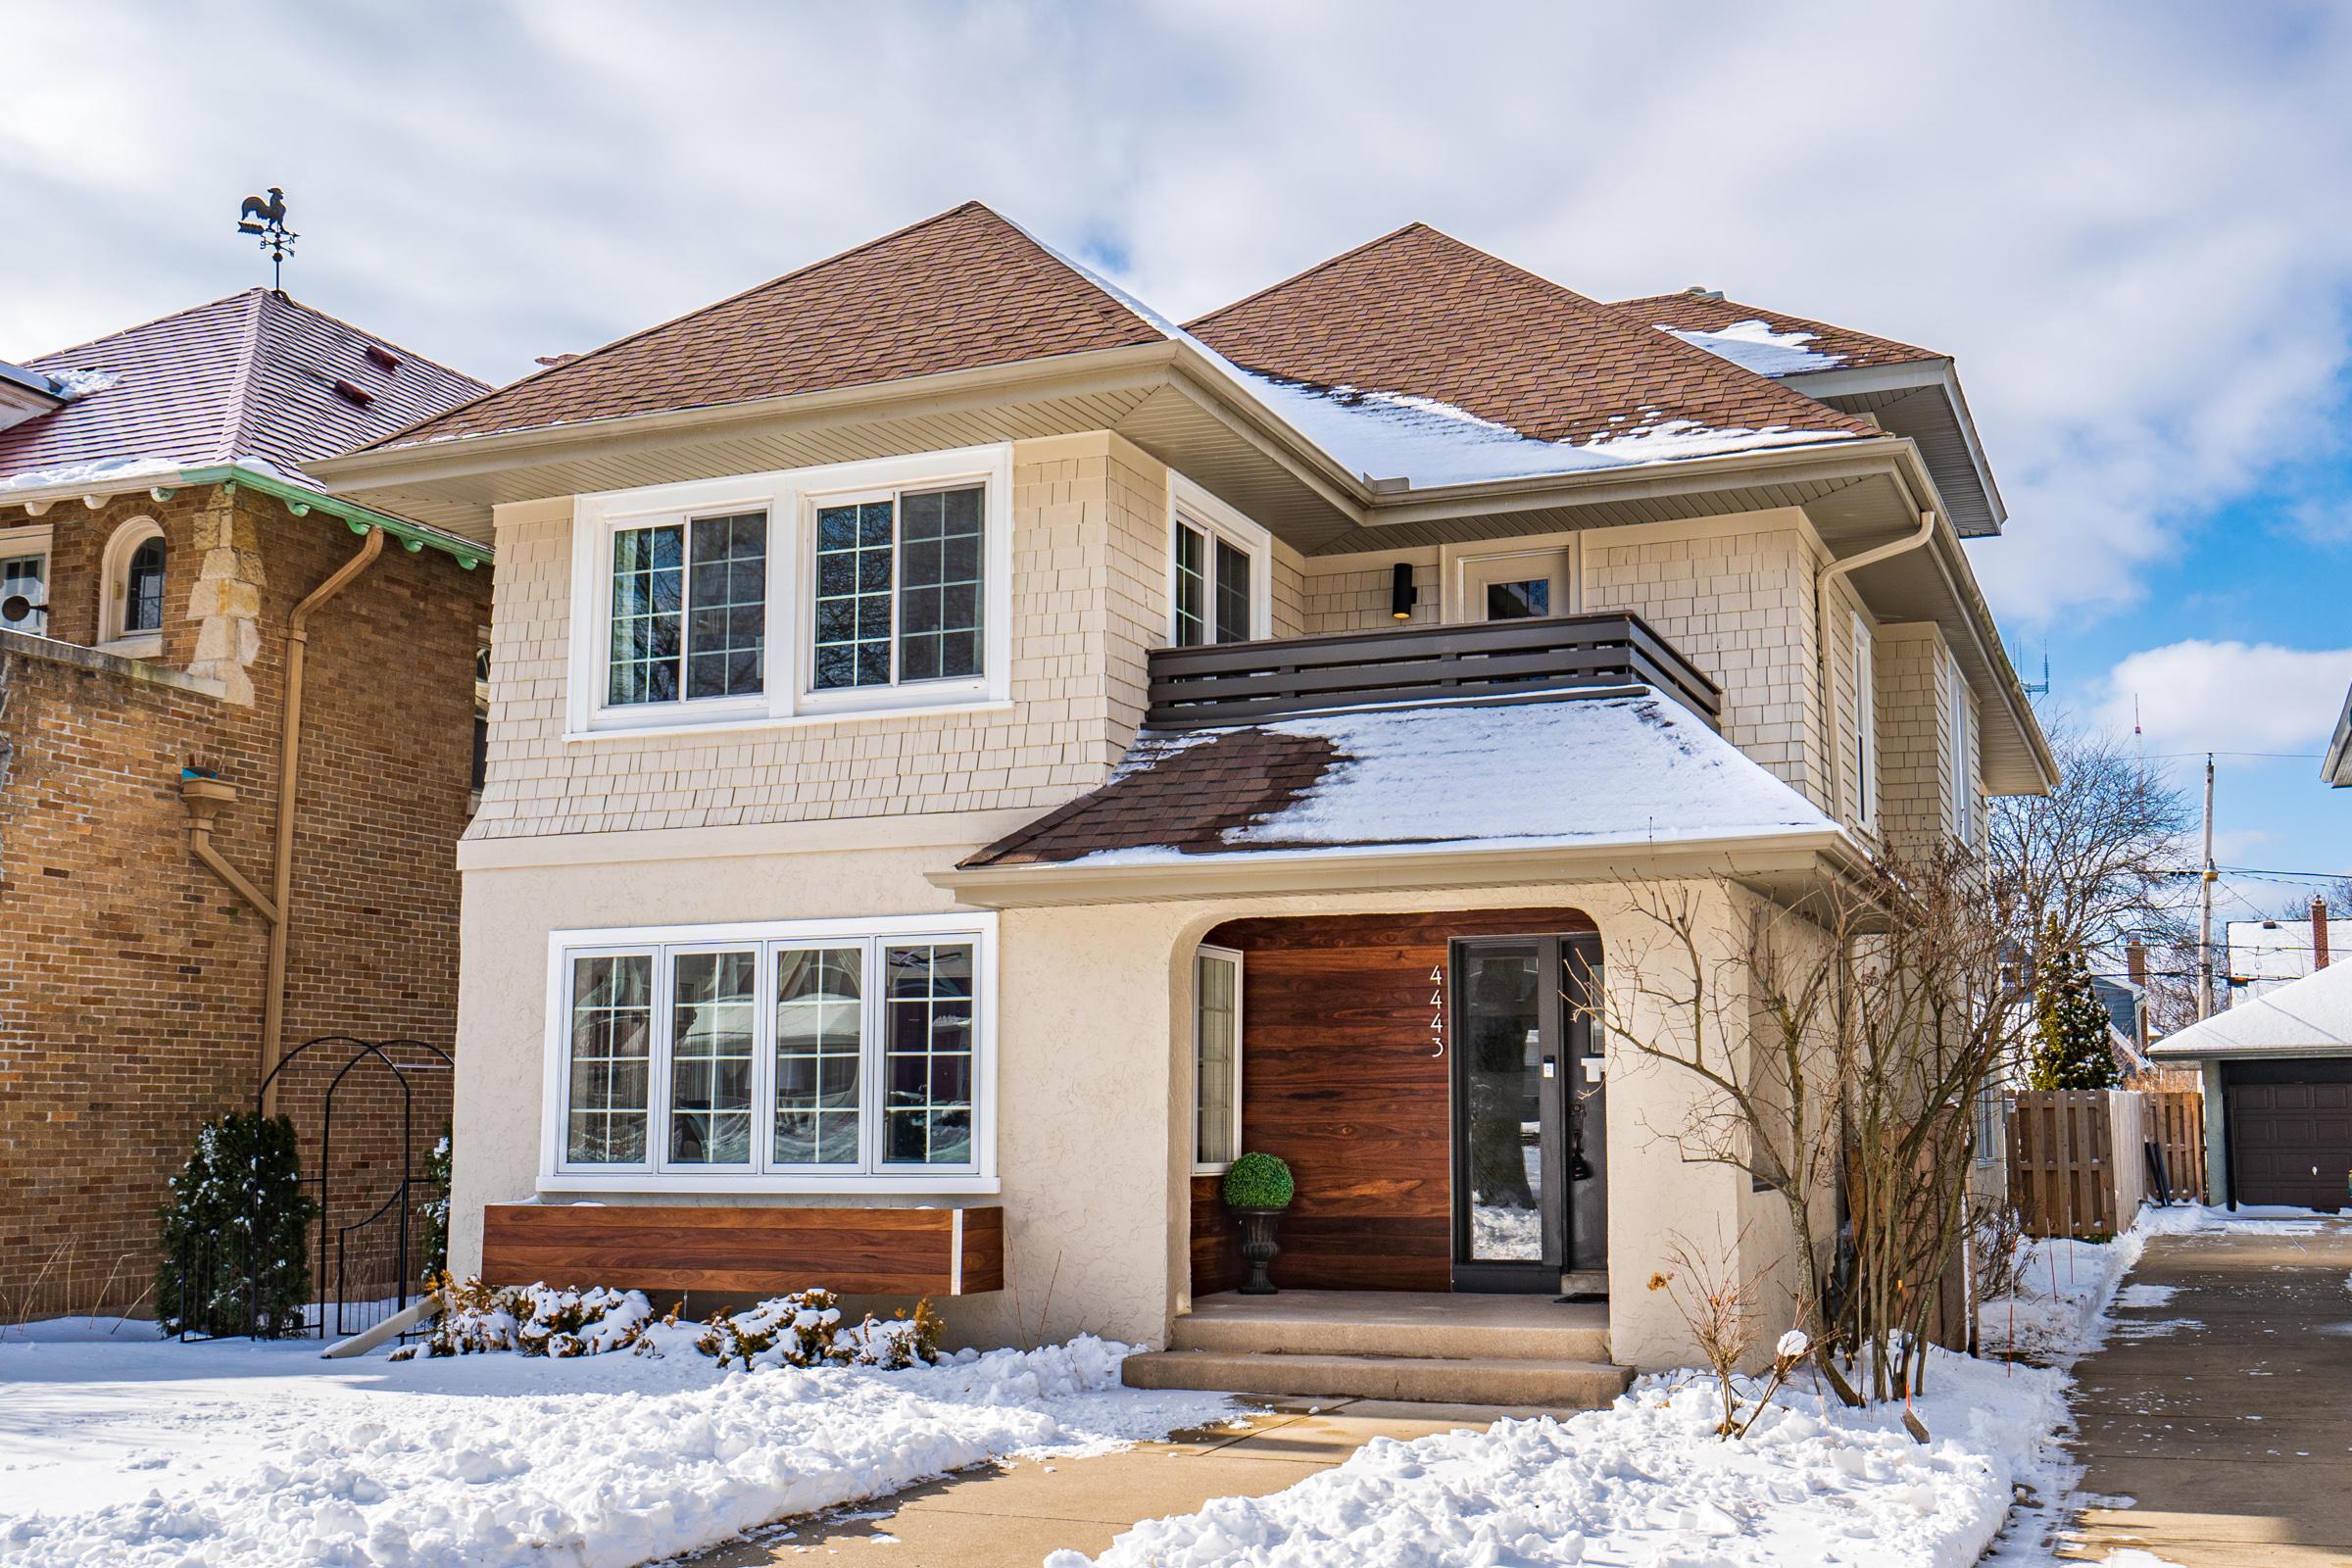 4443 N Frederick Ave Shorewood, WI 53211 Property Image